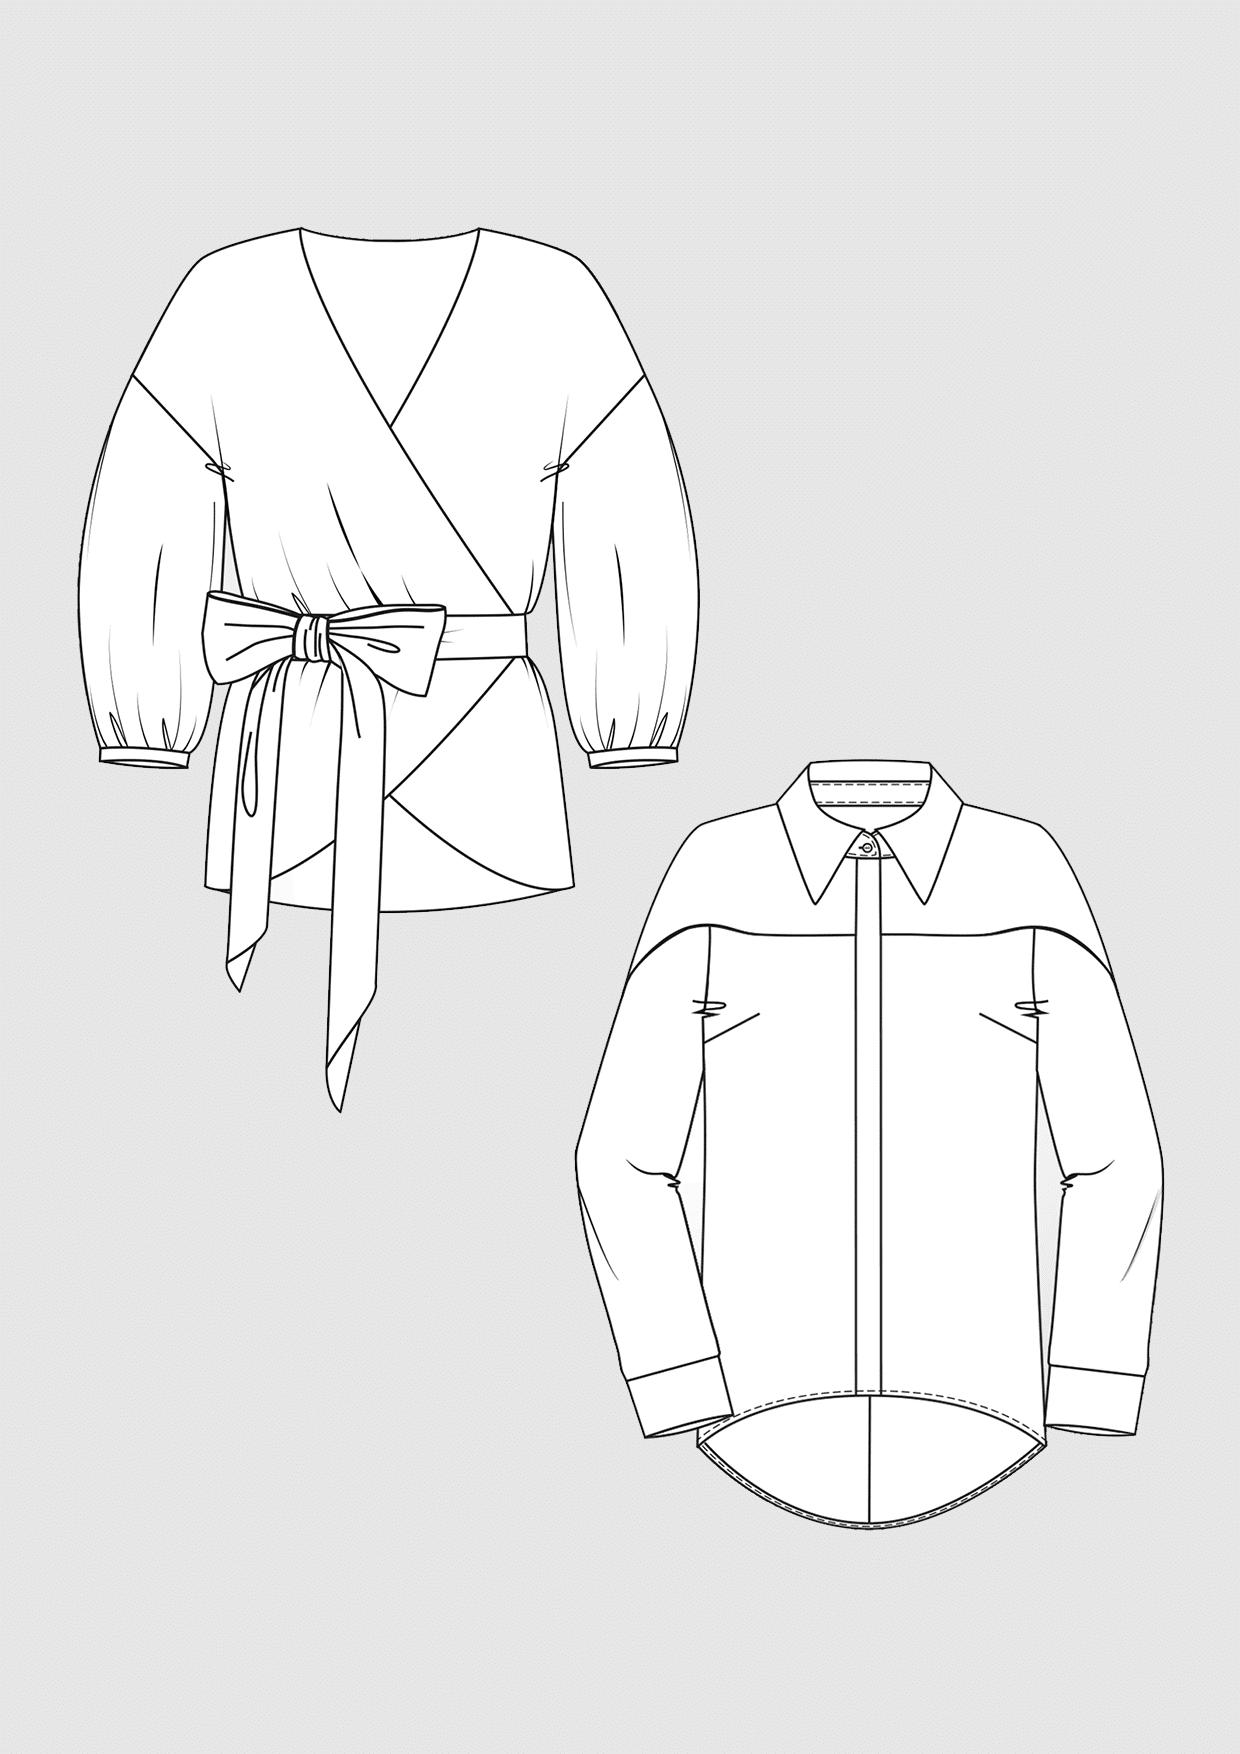 Produkt: Schnittmuster Hemd- und Wickel-Bluse